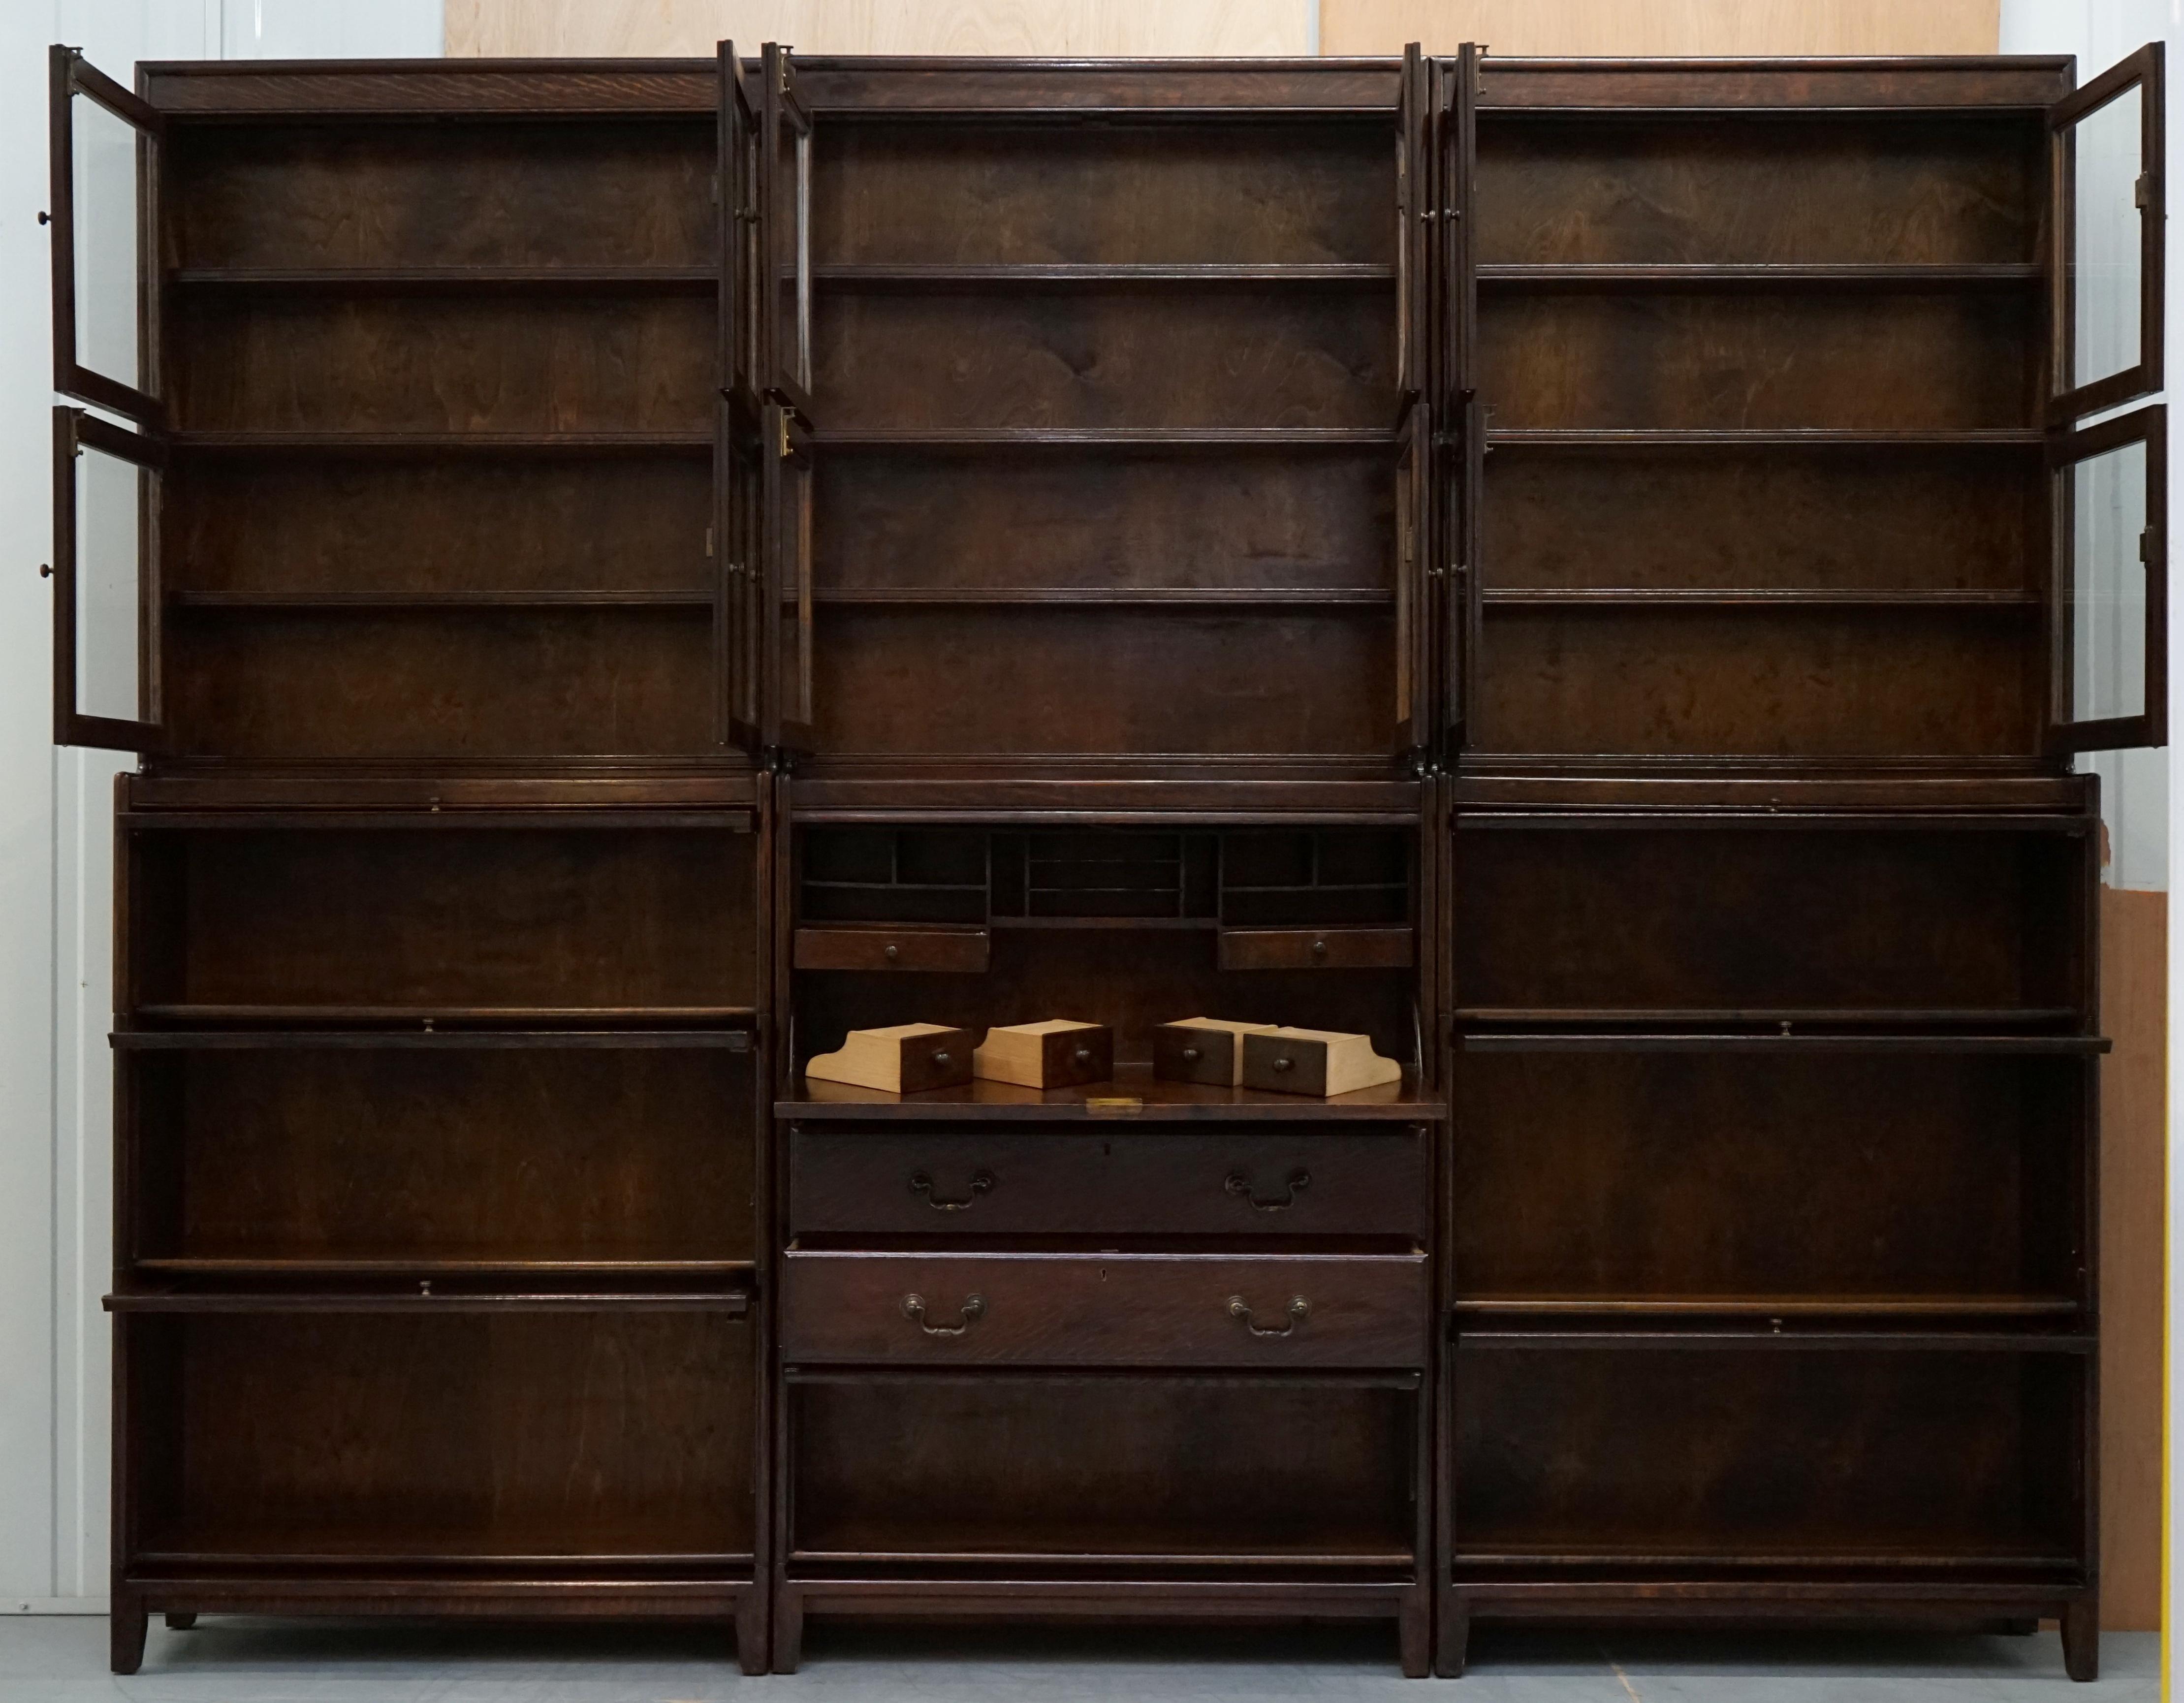 3 Rare 1920s Gunn Library Stacking Bookcases Desk Bureau Minty Globe Wernicke